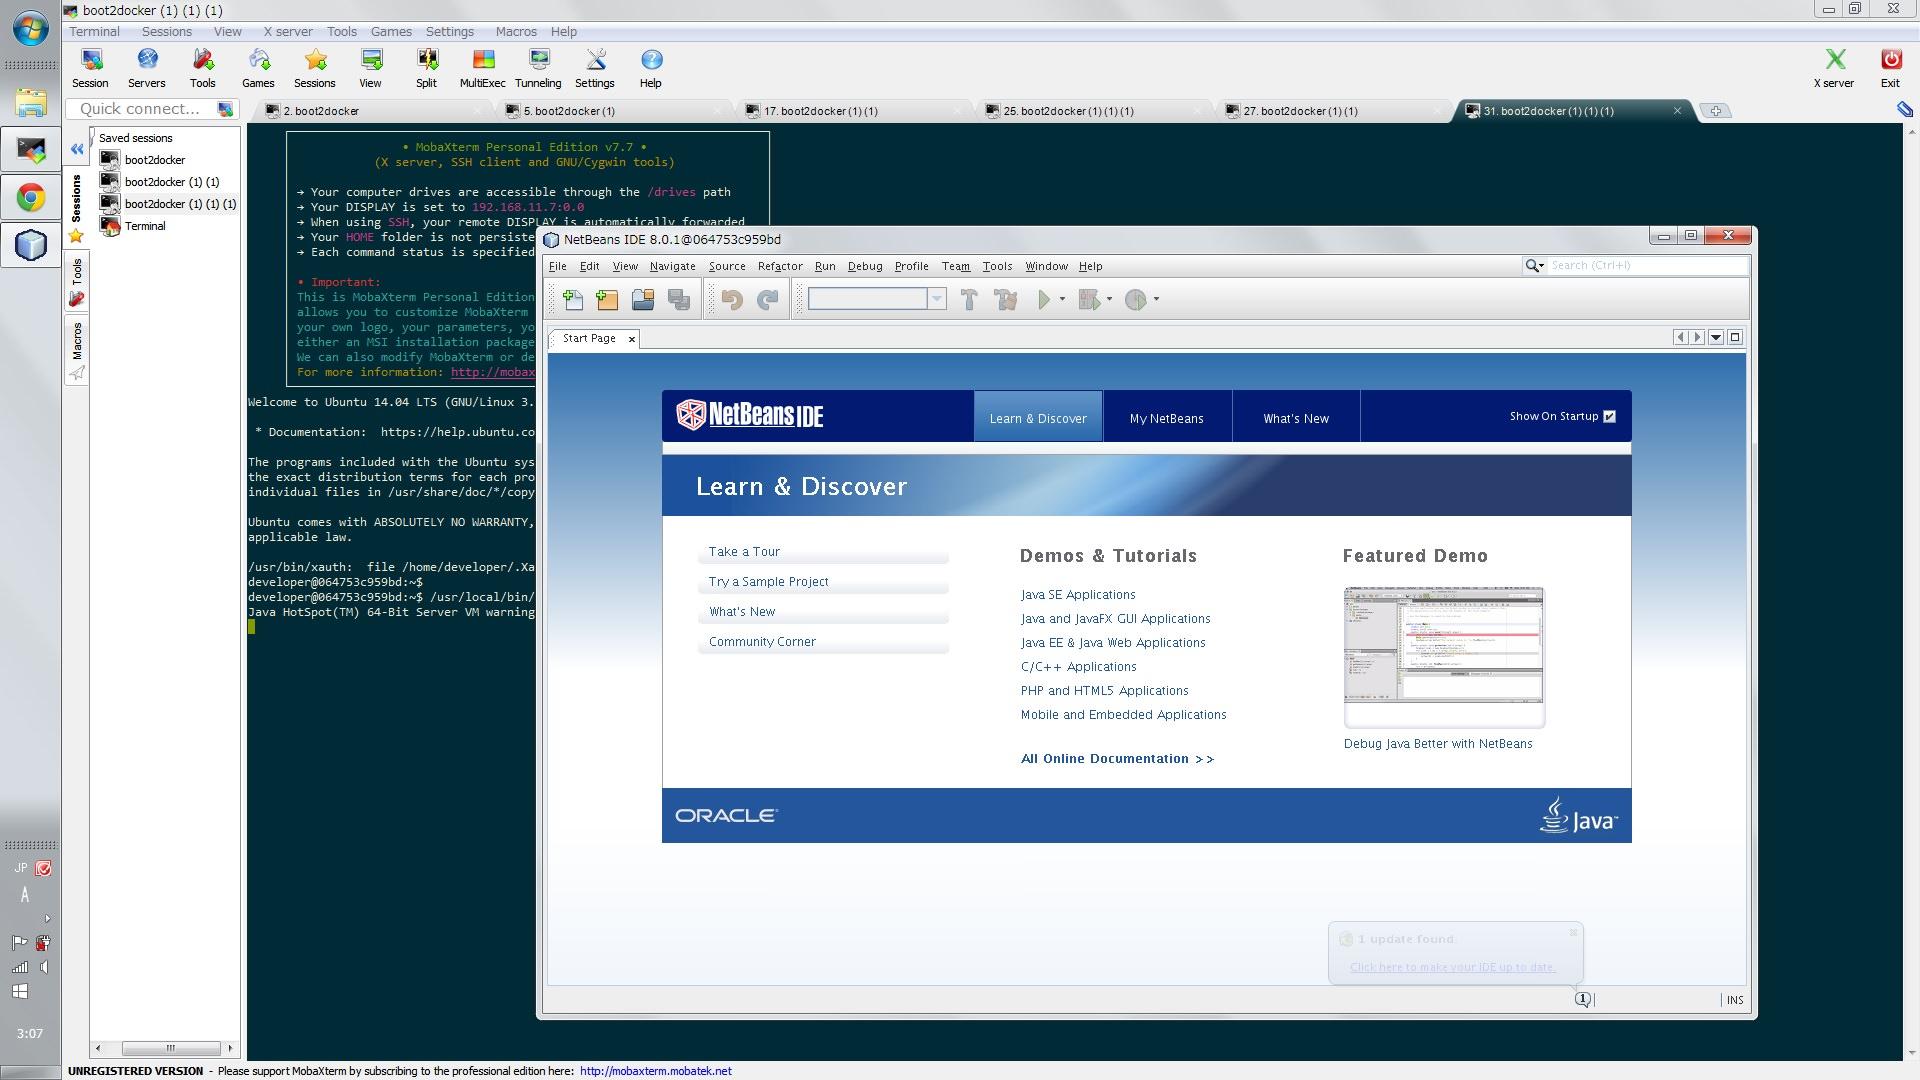 NetBeans_mini.jpg